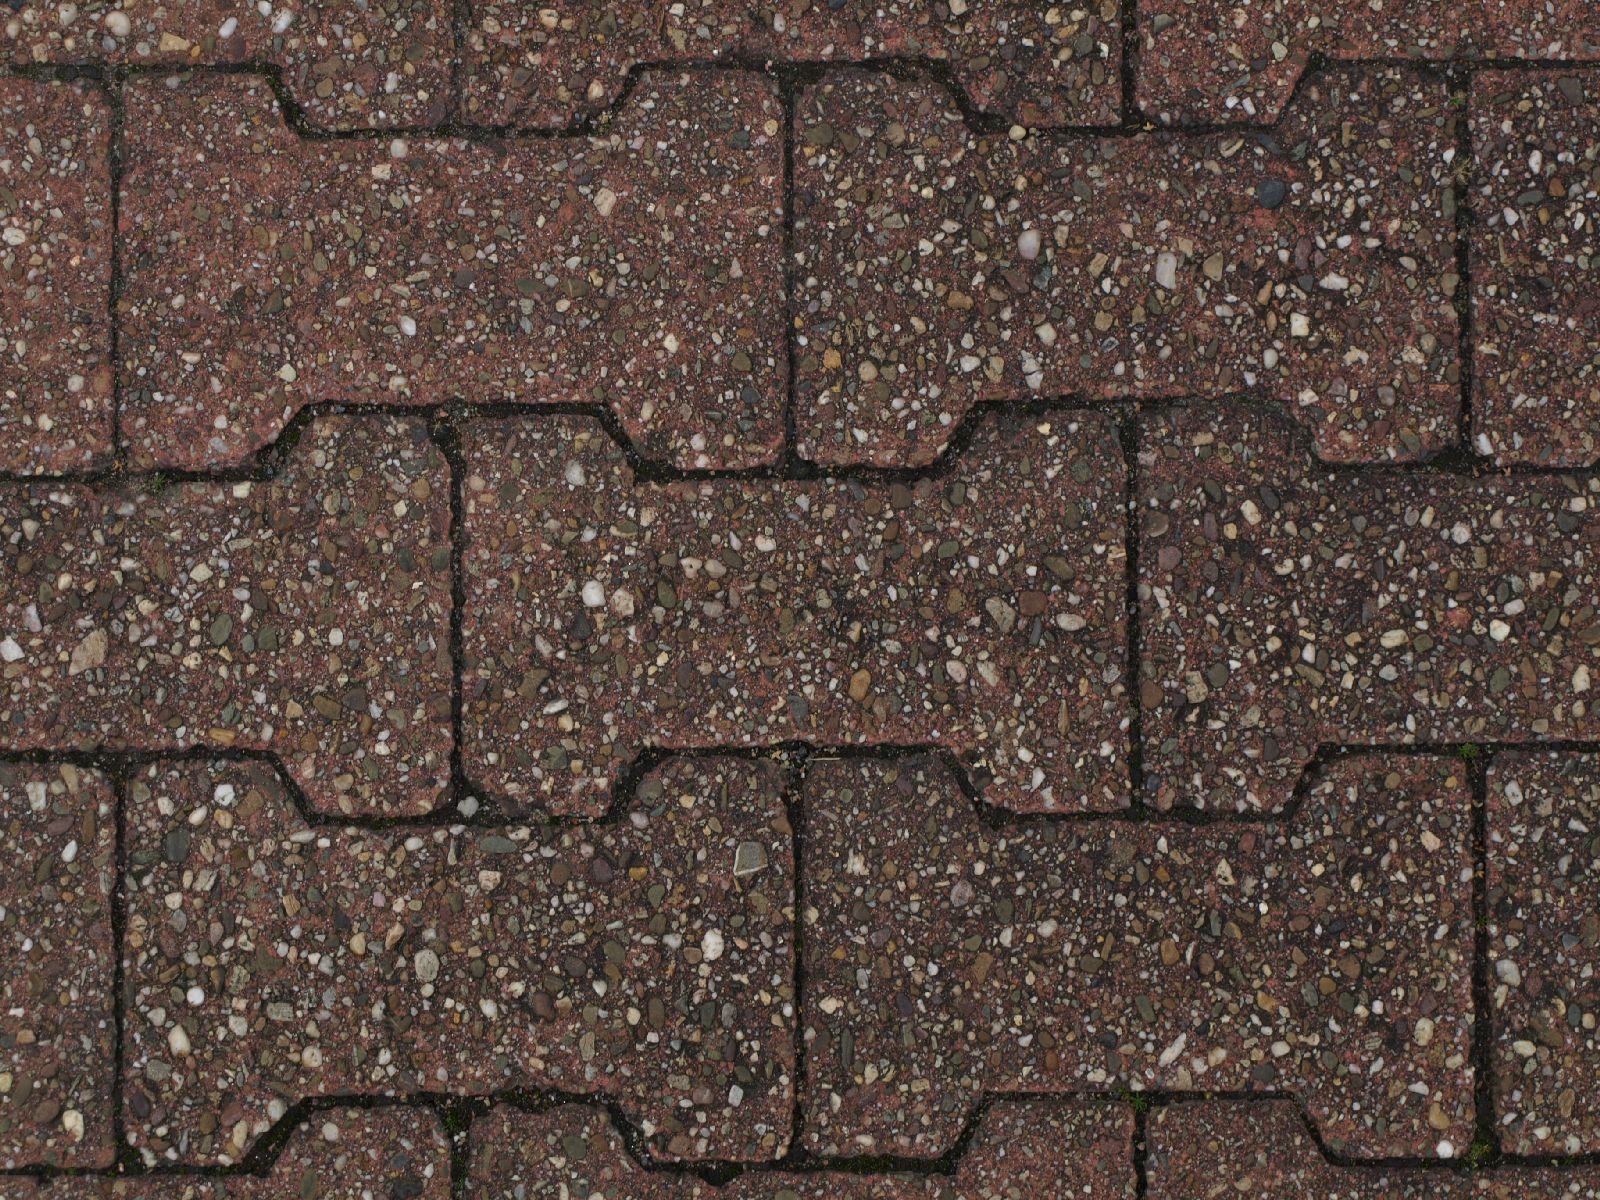 Boden-Gehweg-Strasse-Buergersteig-Textur_A_PA045716